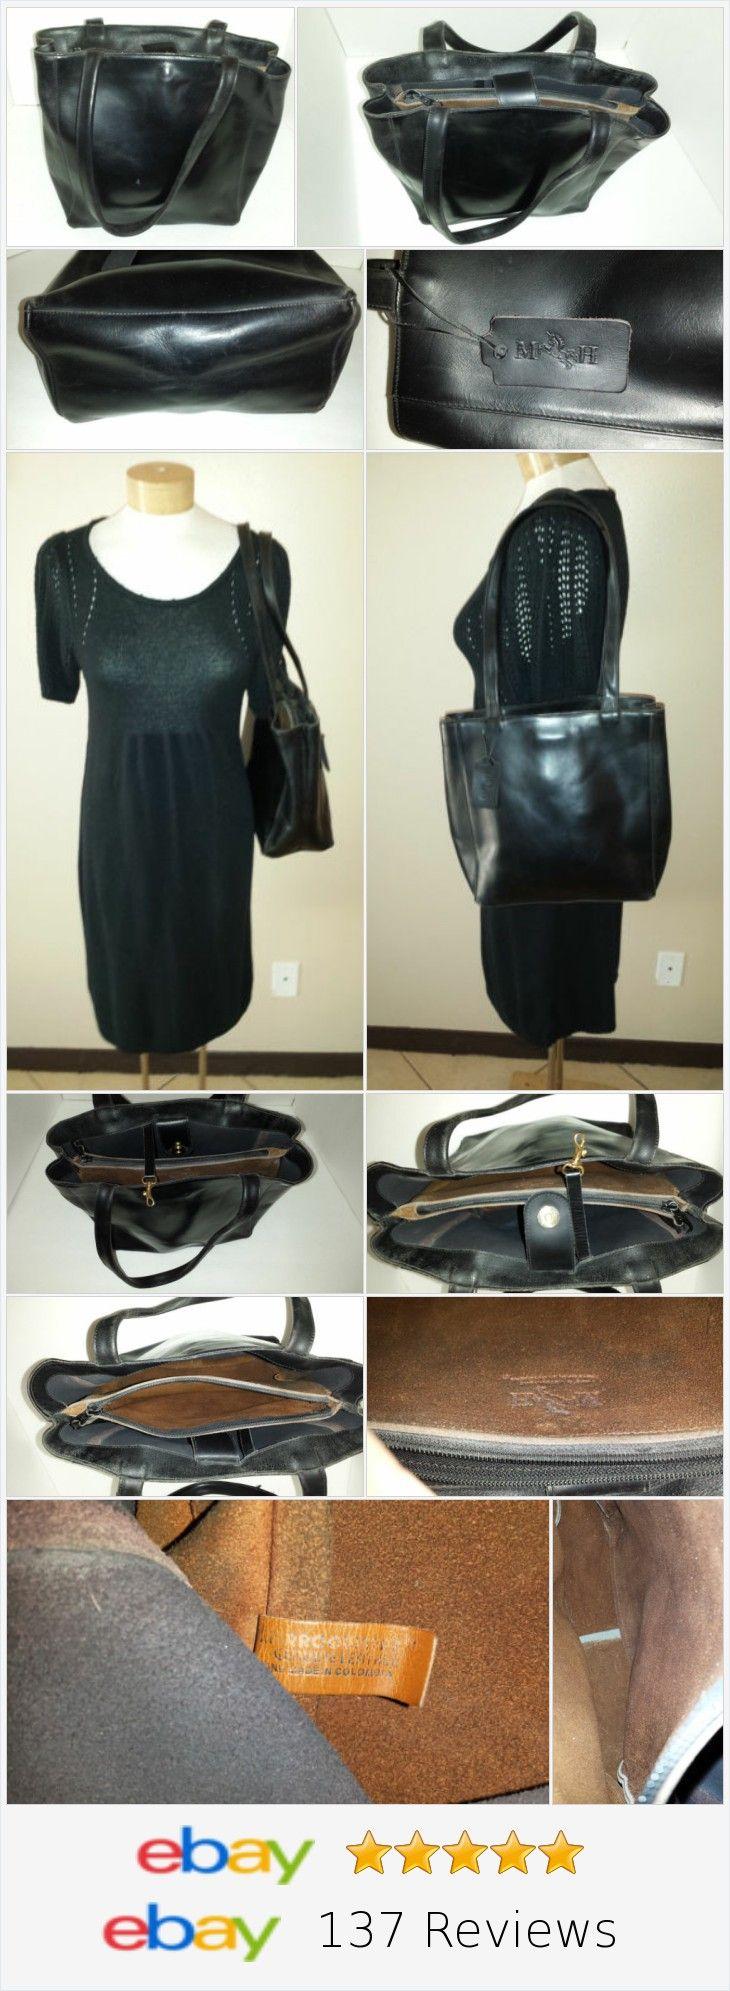 MH Mario Hernandez Black Leather Shoulder Bag Tote Made Columbia http://stores.ebay.com/shopabbygirl?_rdc=1